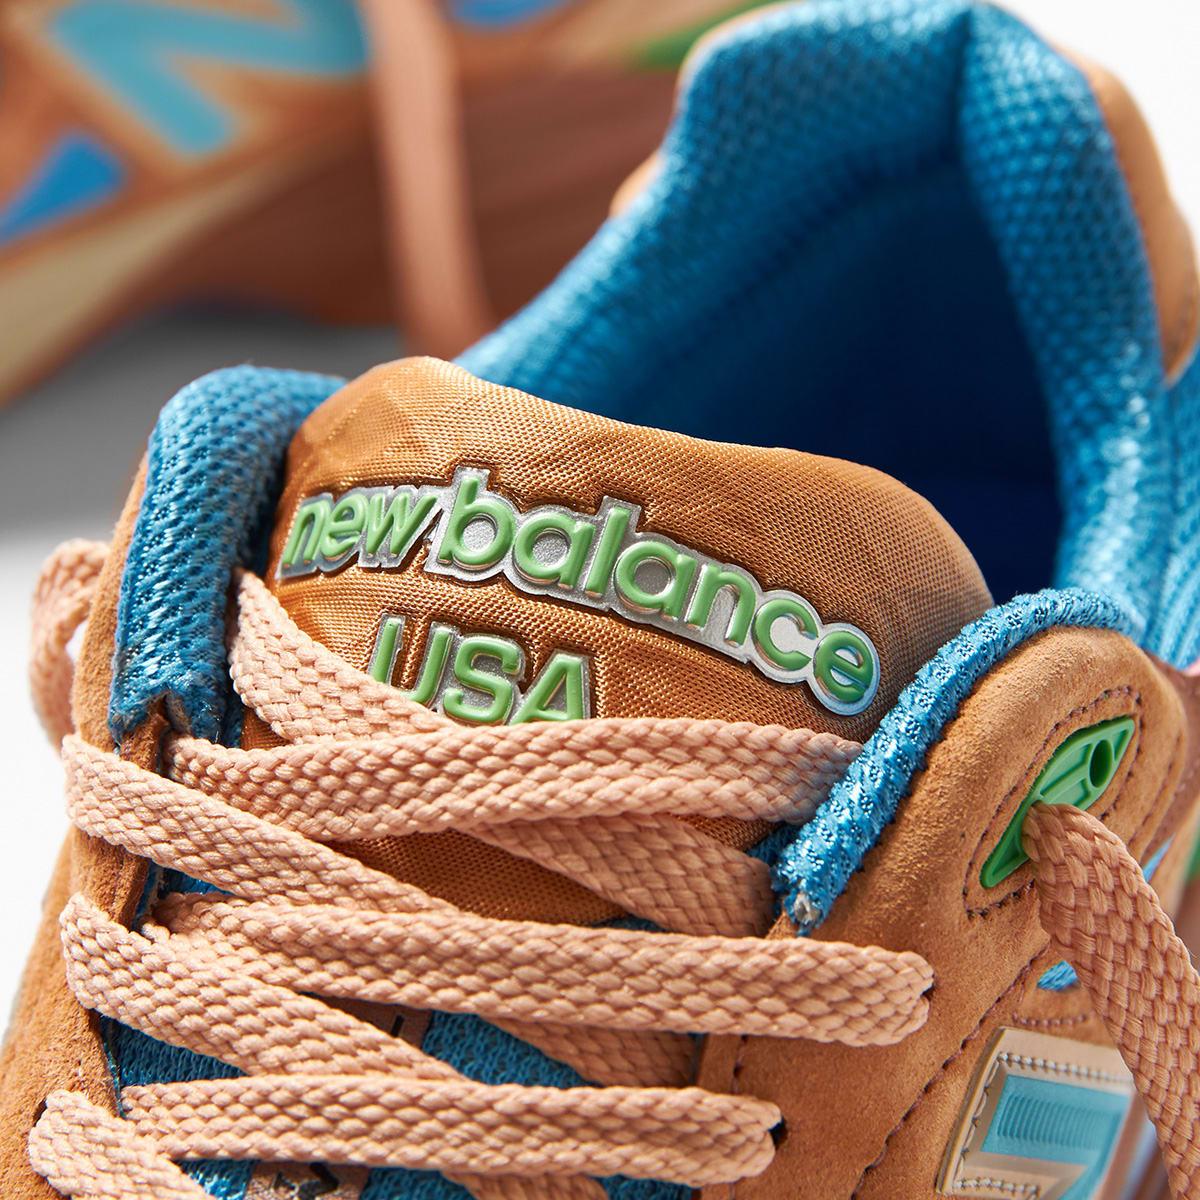 New Balance x Joe Freshgoods 990v3 - M990JG3